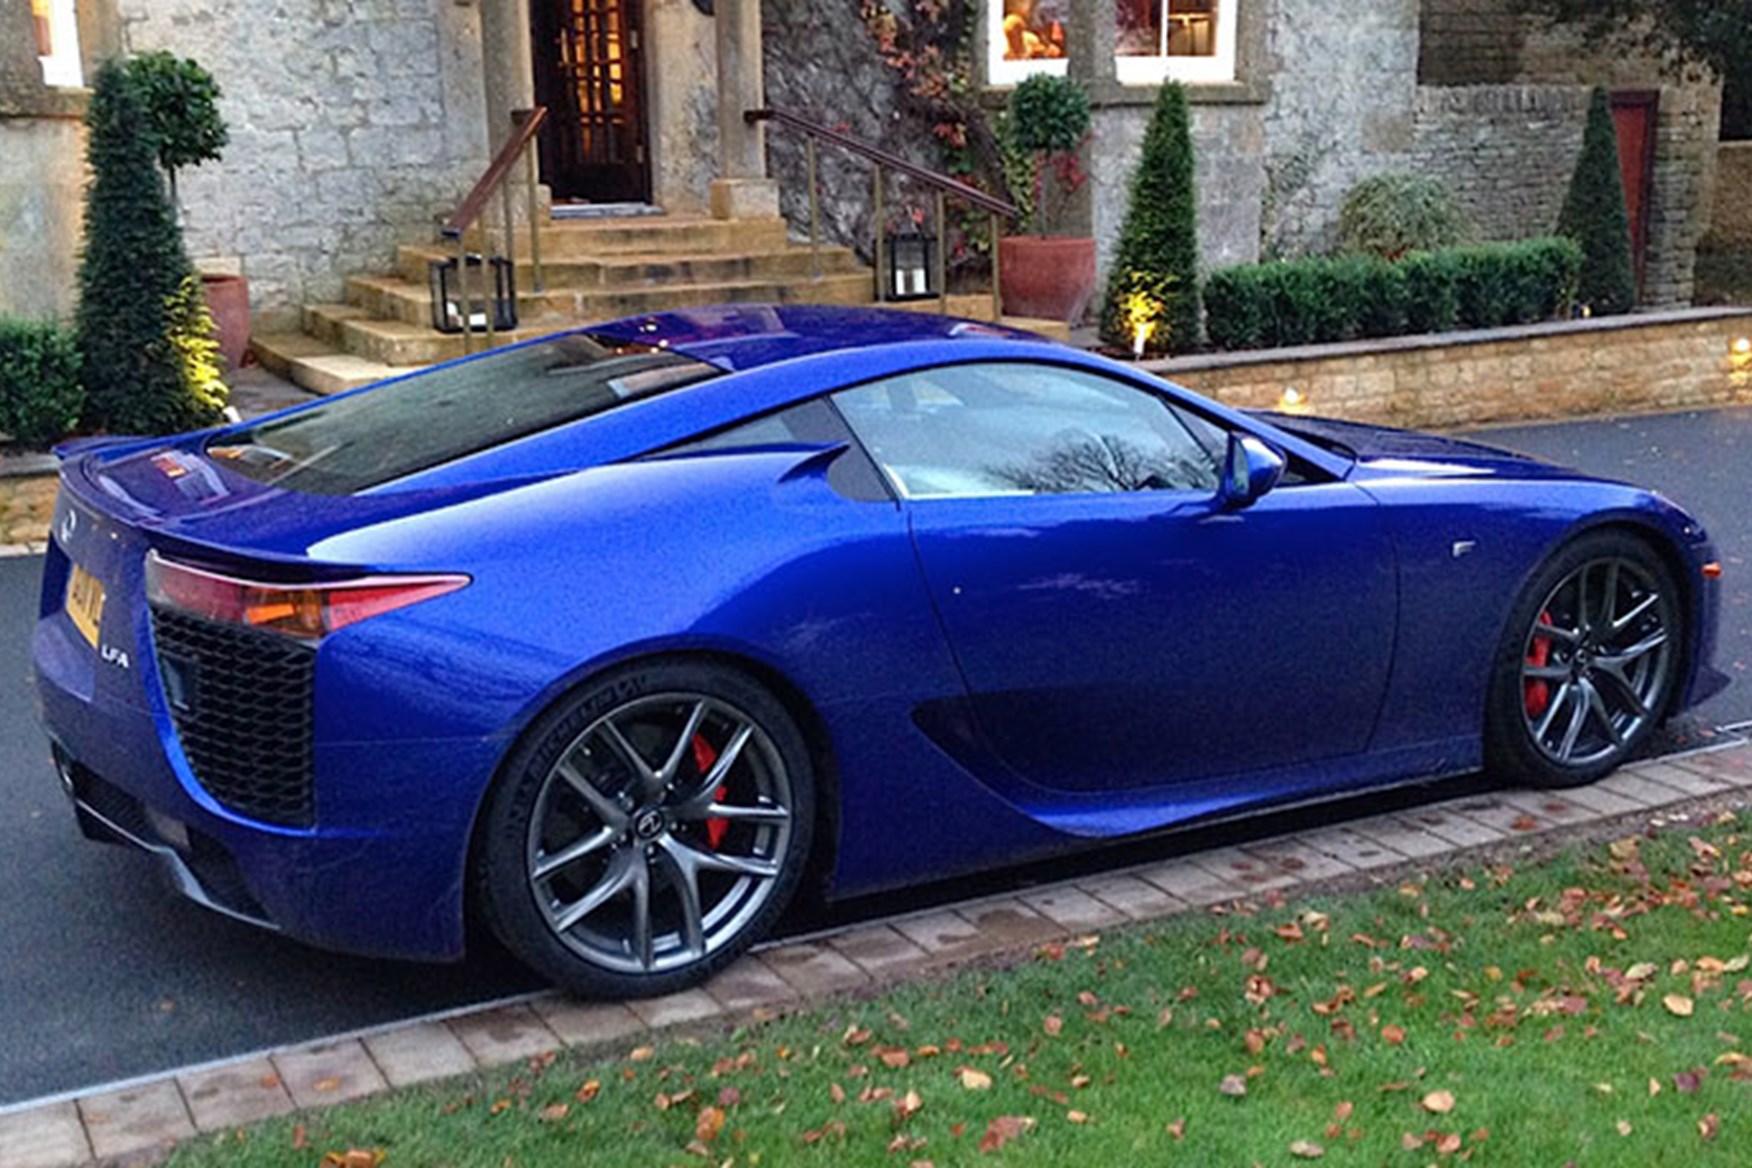 ... Still Looking Great Today: The Lexus LFA Supercar